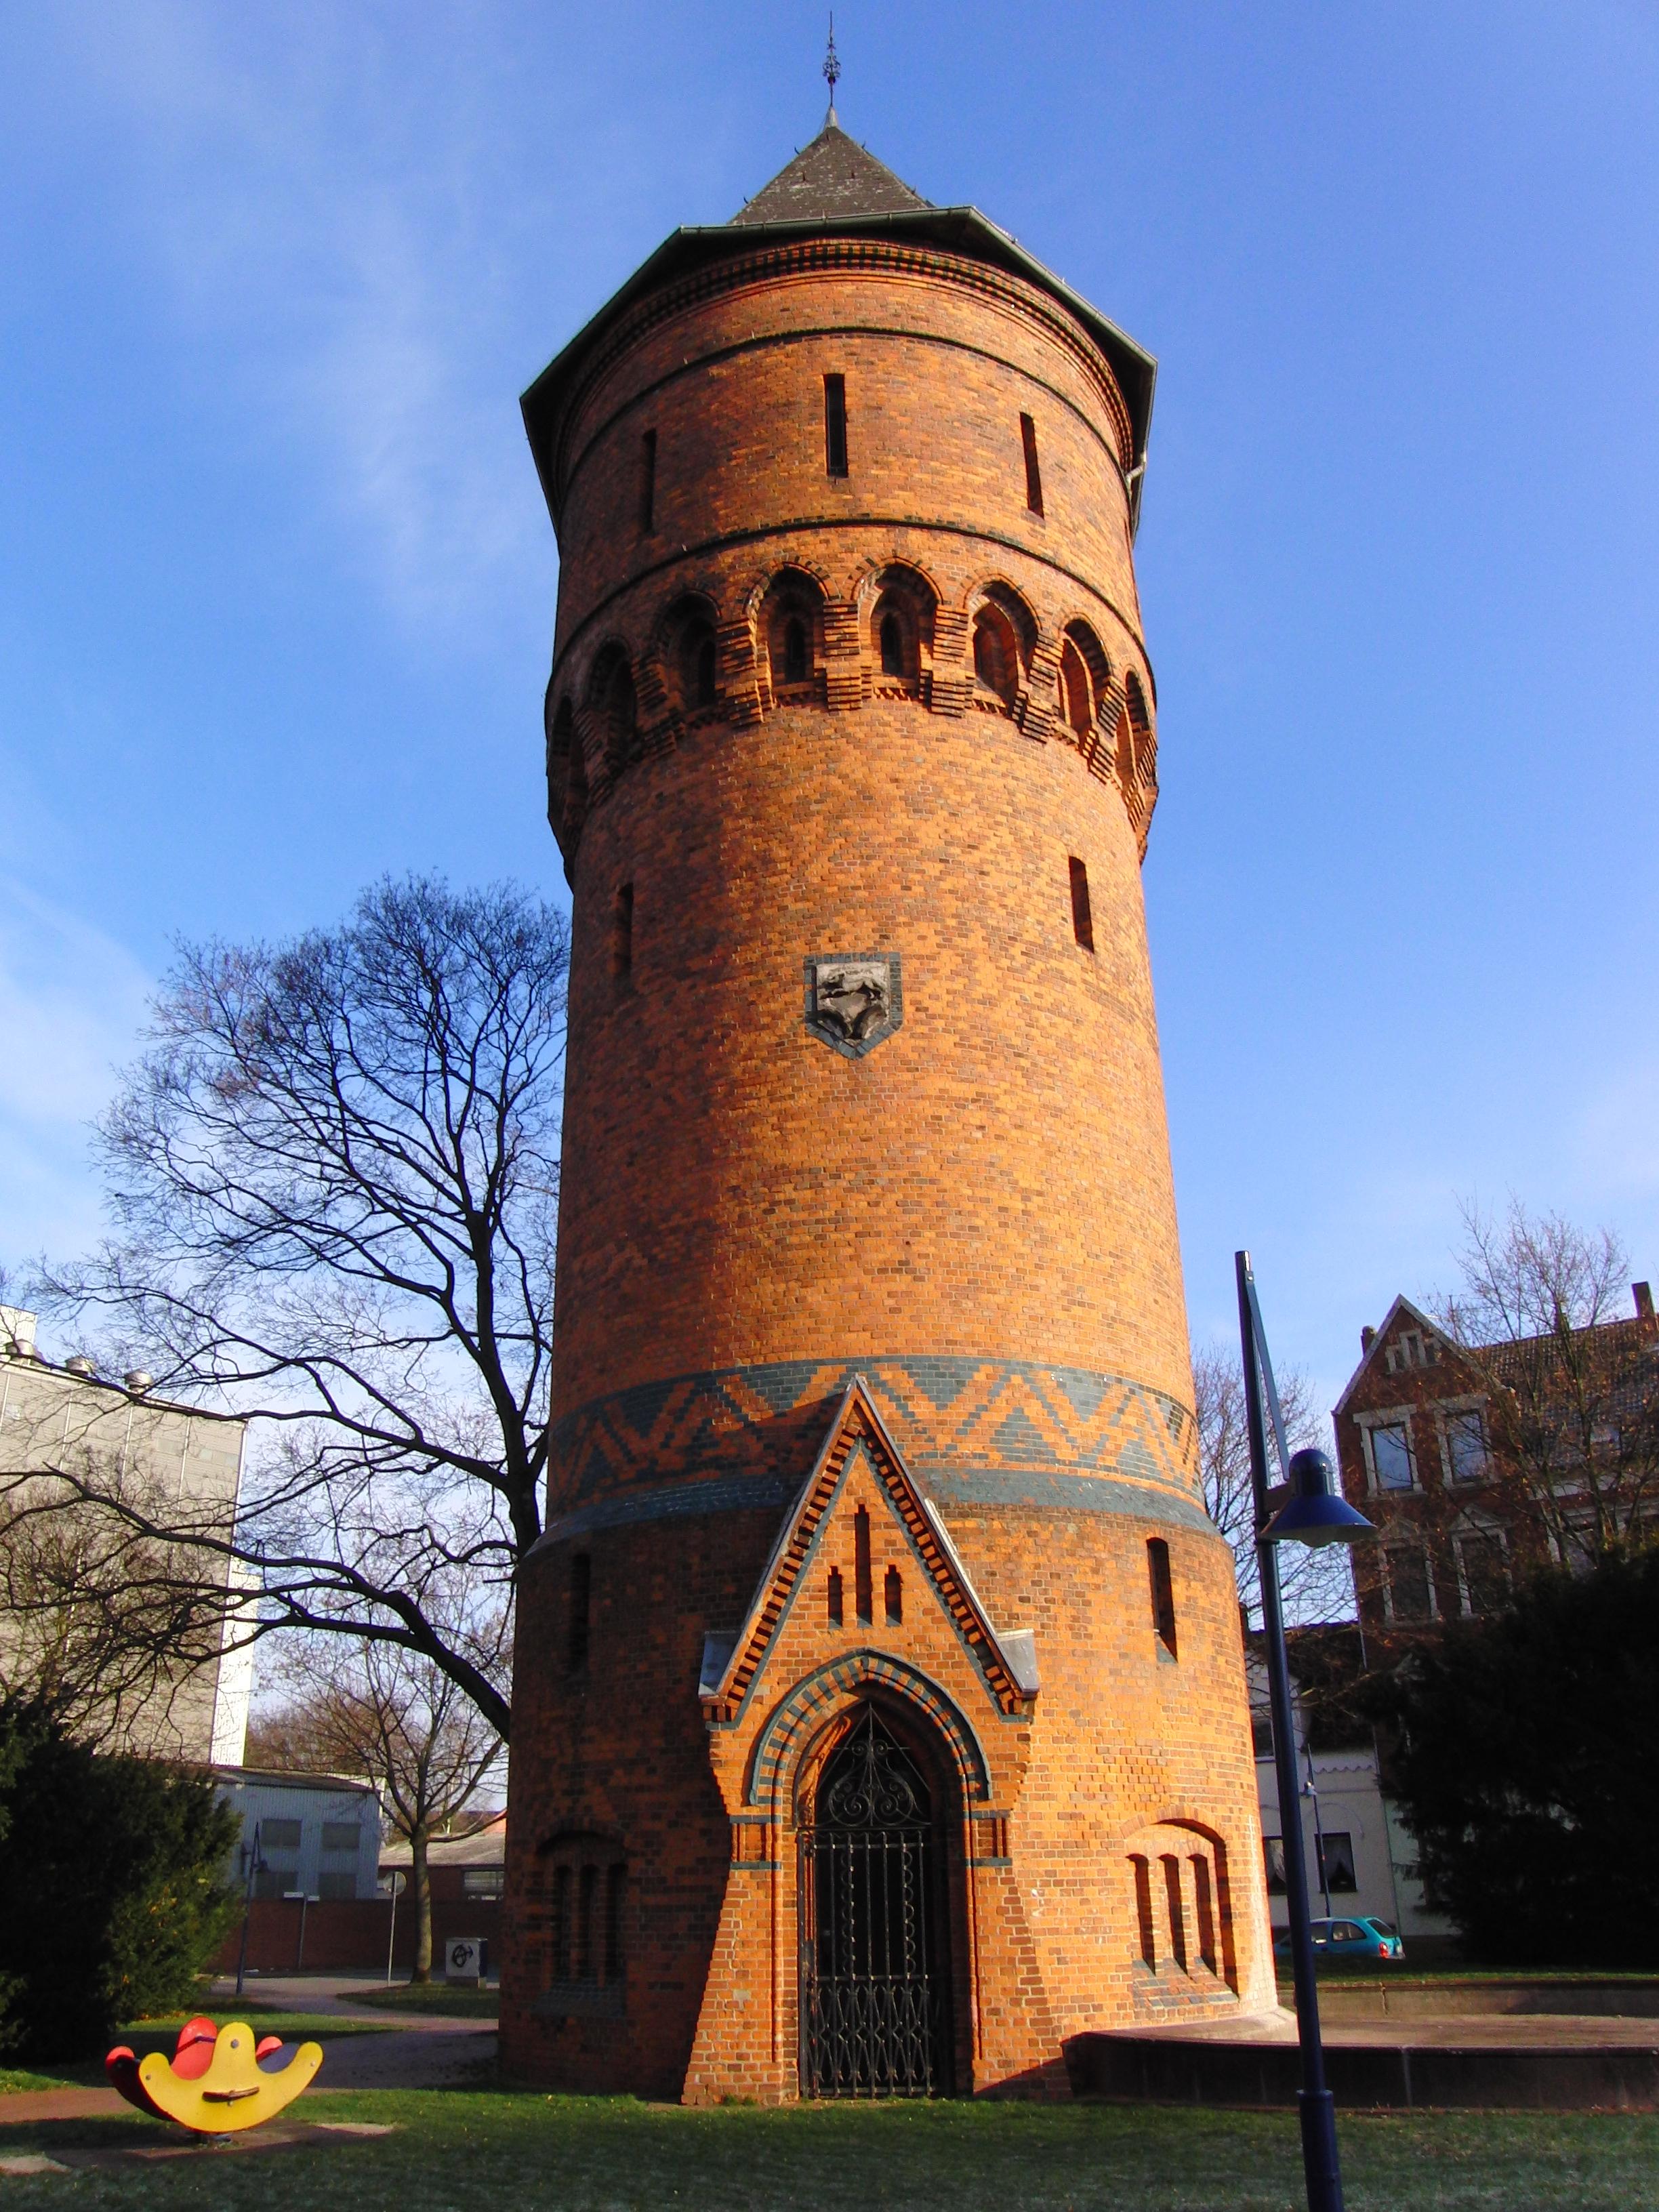 Peine Germany  City new picture : Peine Wasserturm Wikipedia, the free encyclopedia